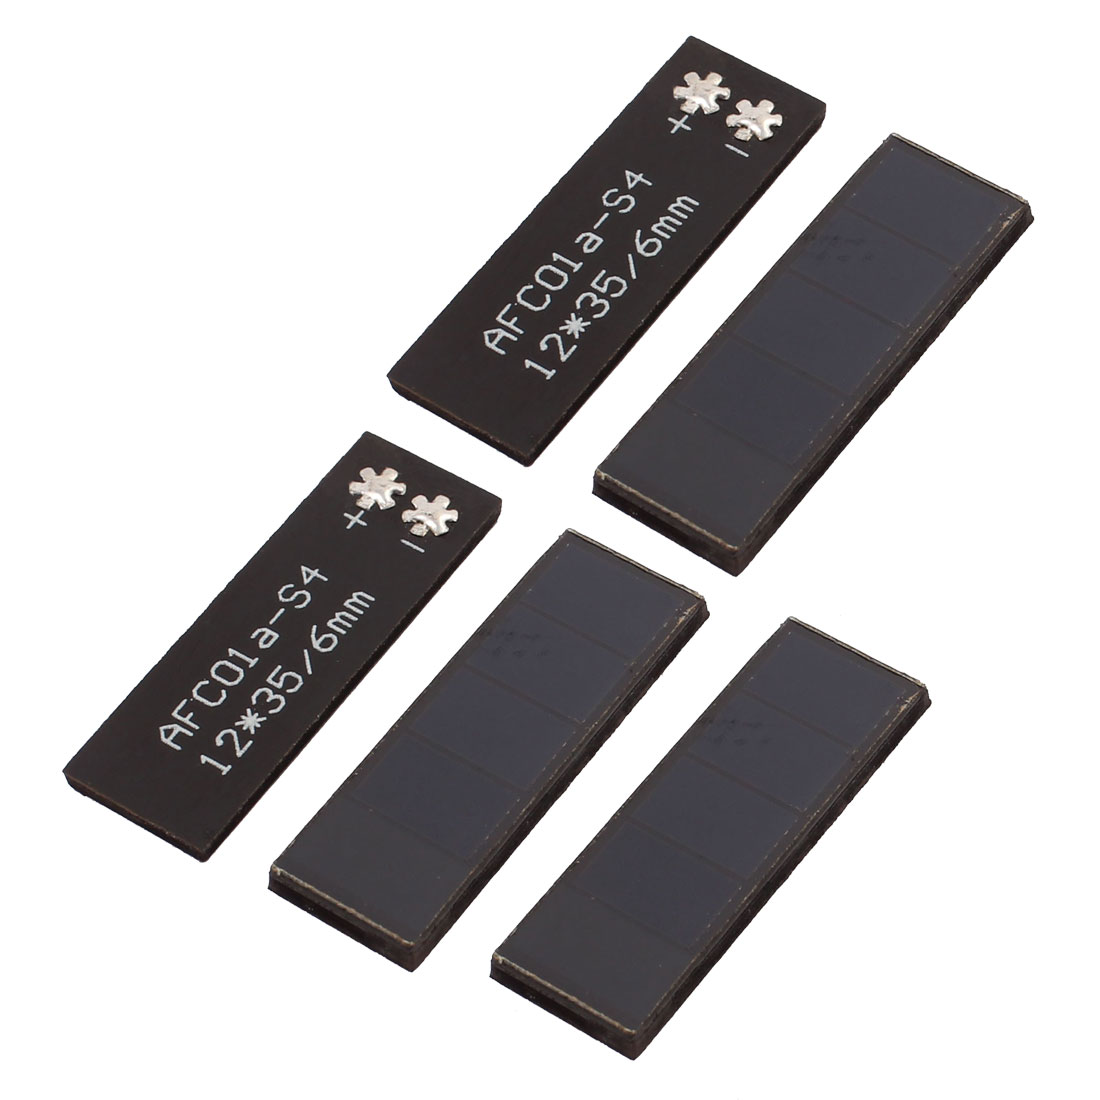 5Pcs 2V 20mA Polycrystalline Solar Cell Panel Module Charging Board 12mm x 35mm